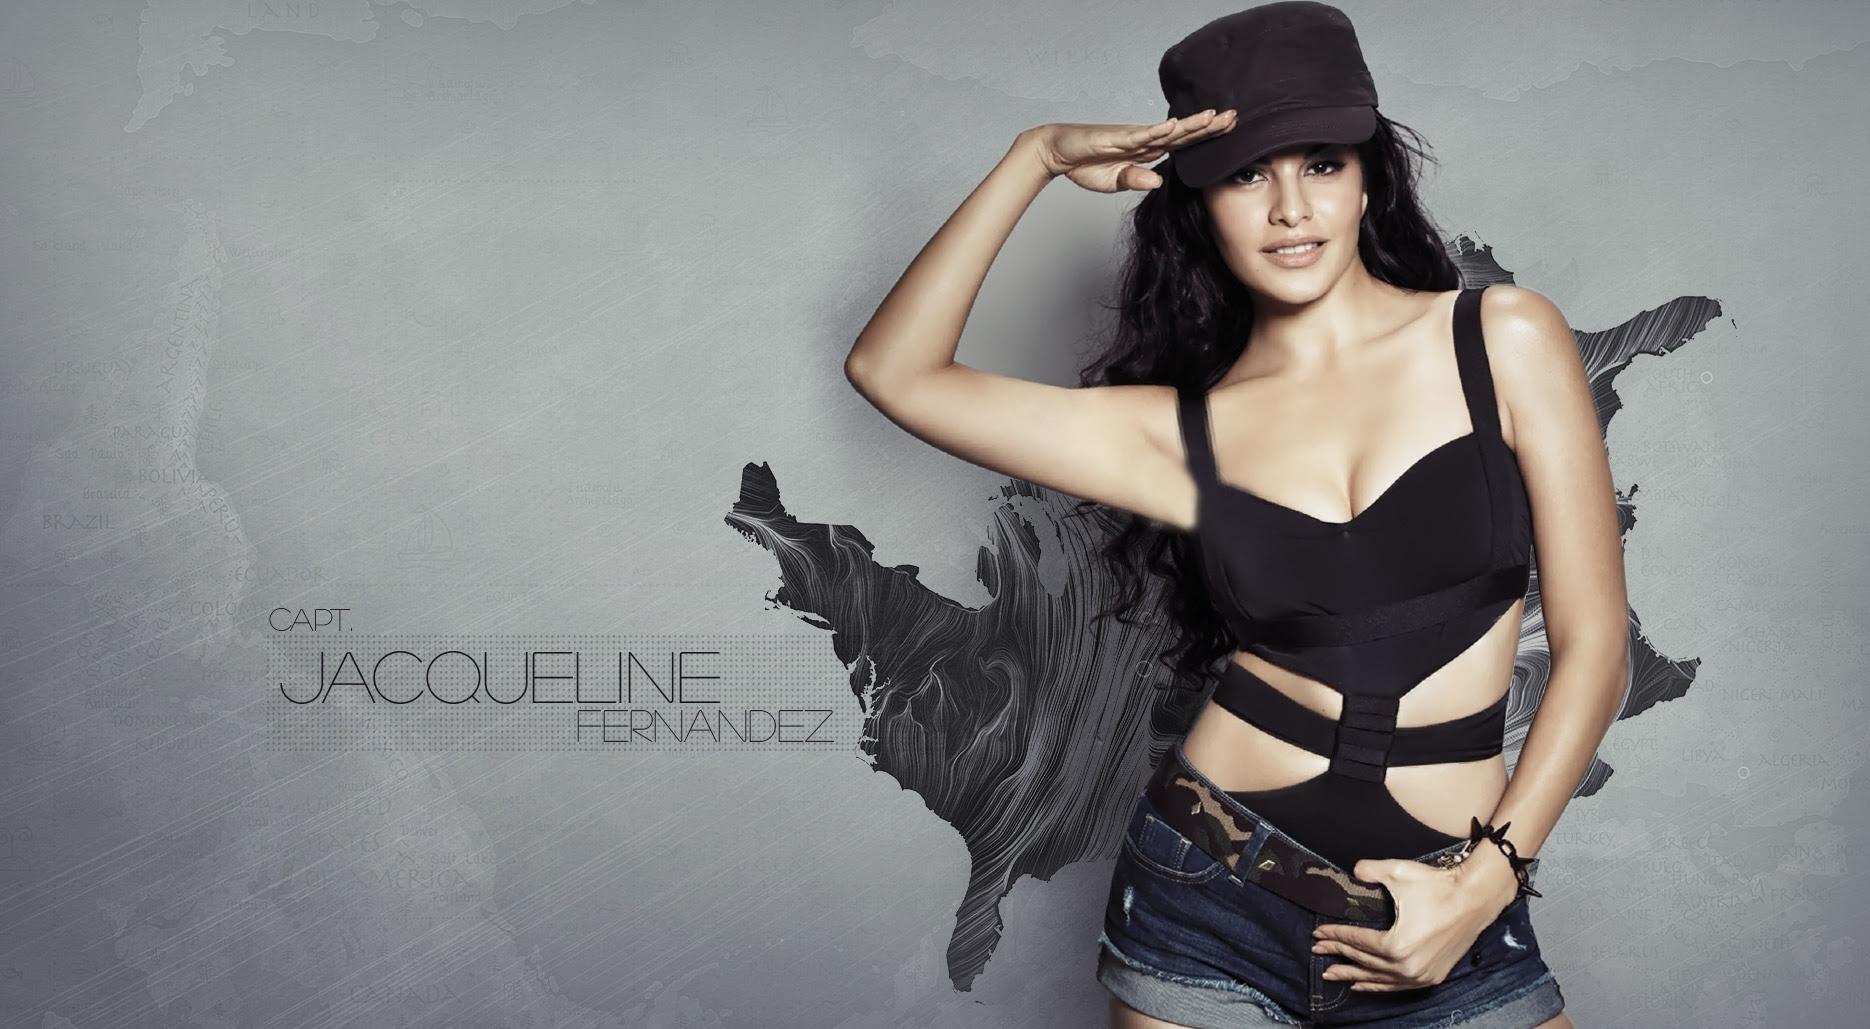 jacqueline fernandez black